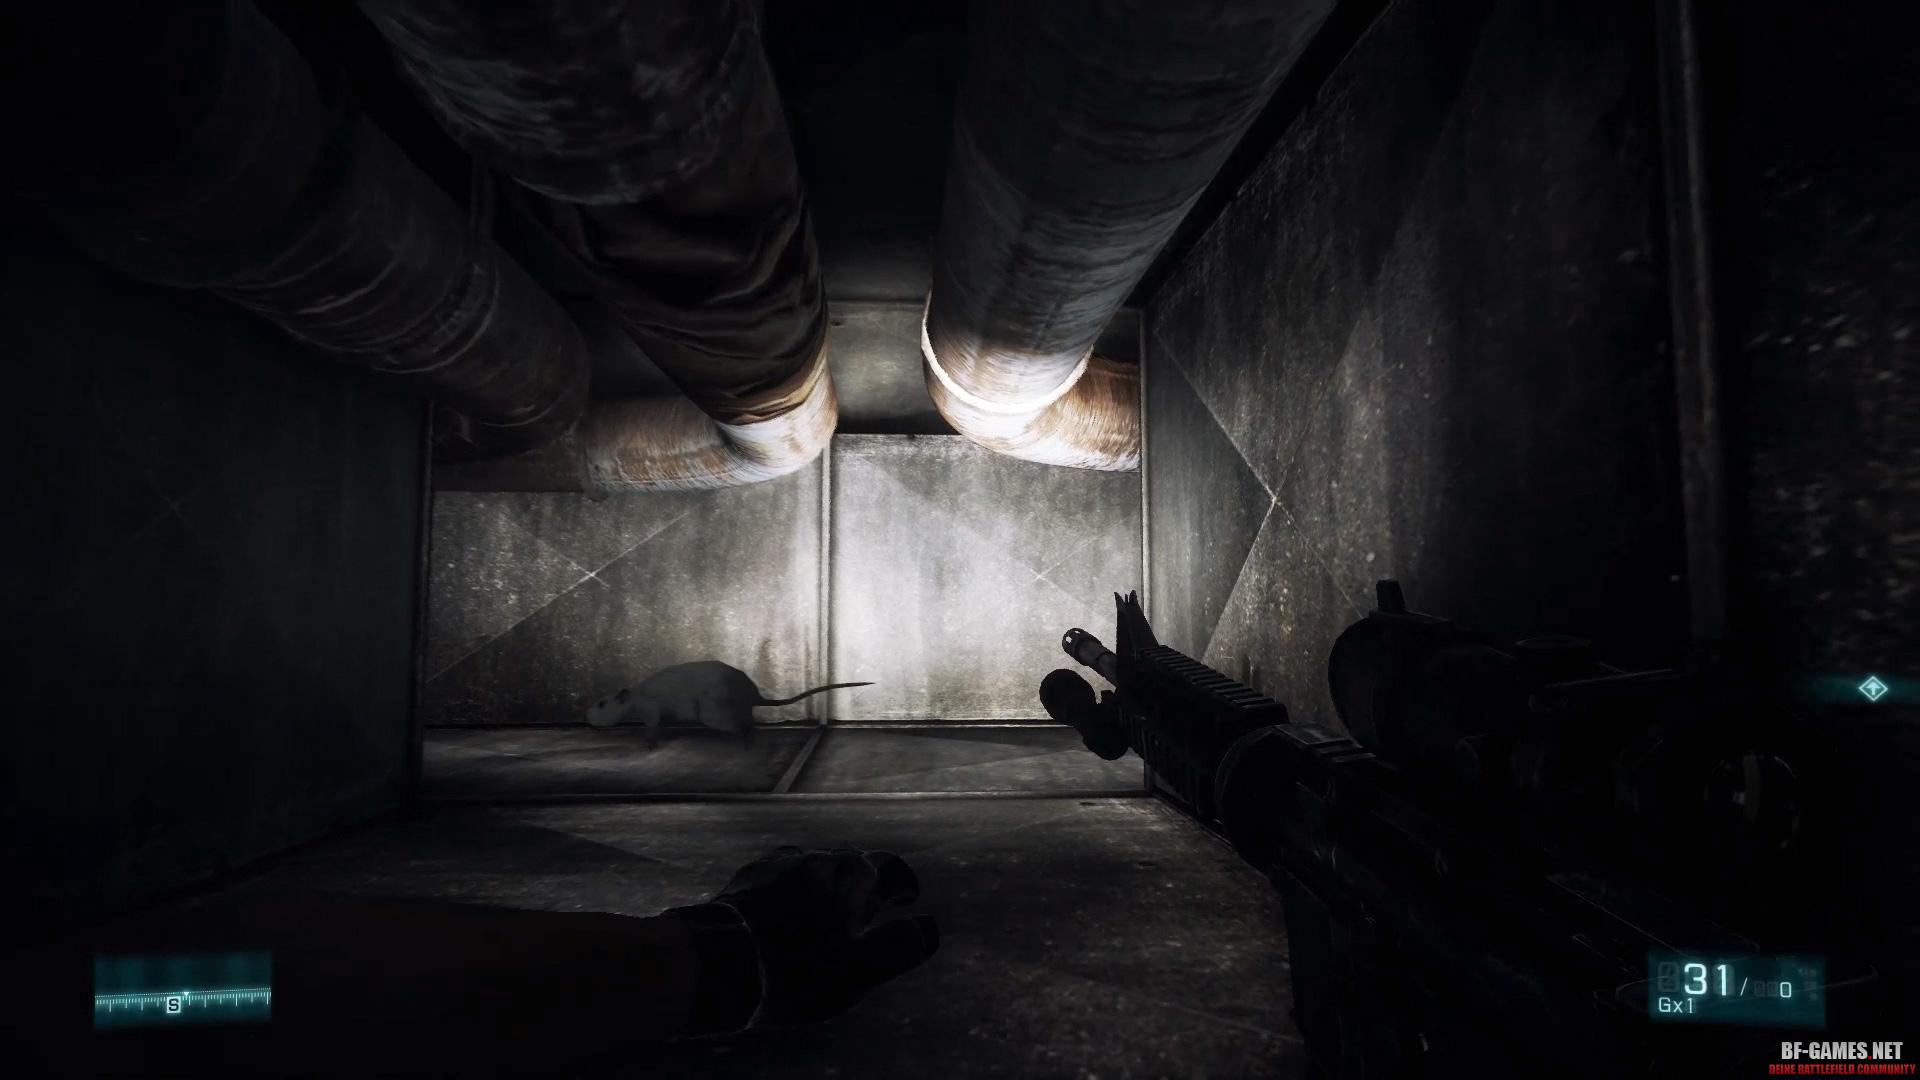 battlefield3_087.jpg